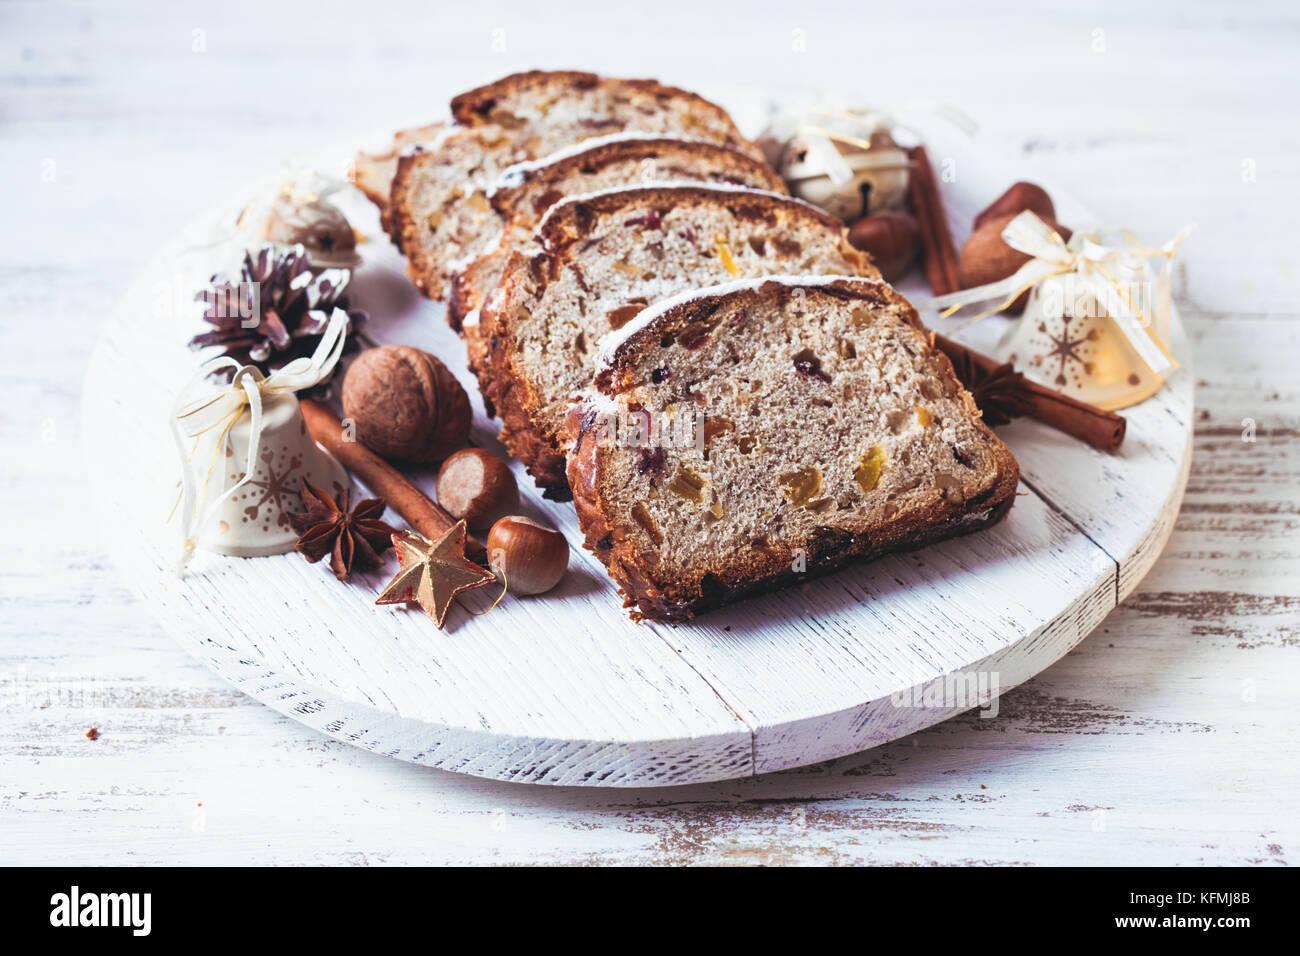 Christmas cake - Stollen - Stock Image